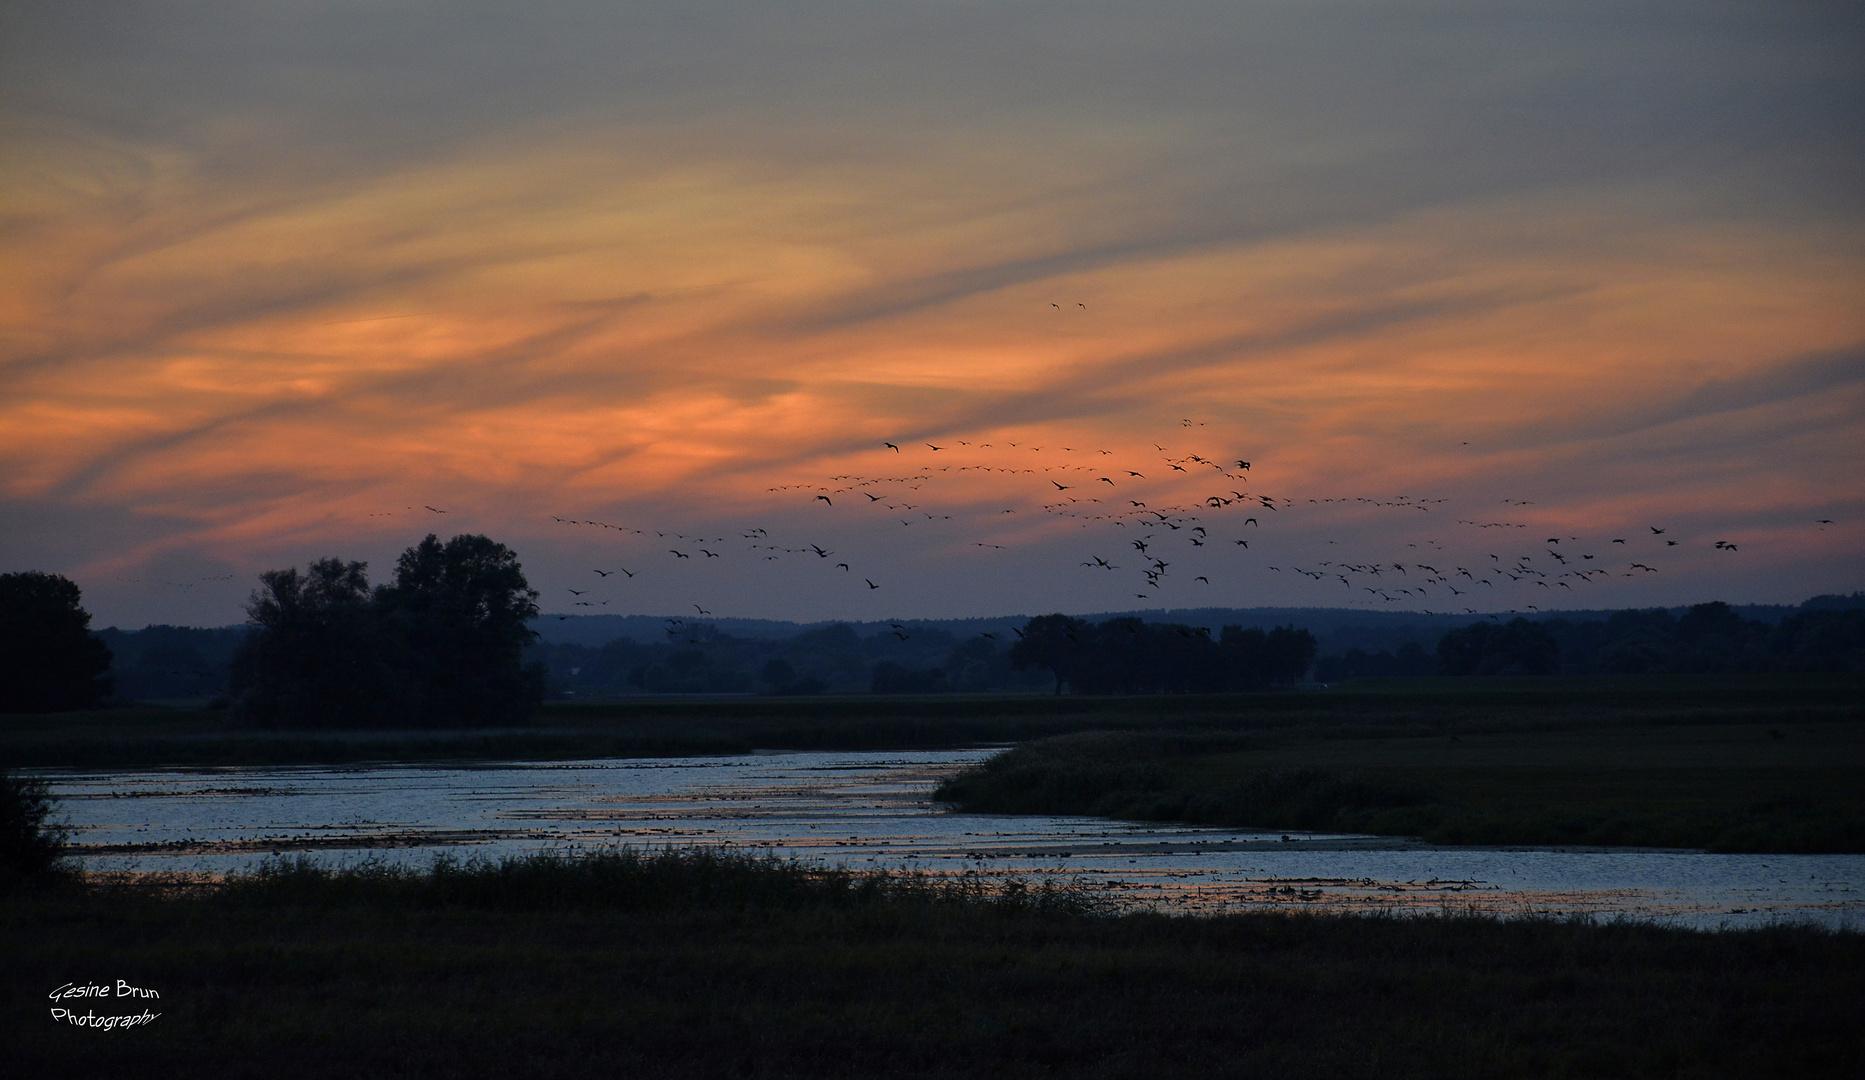 Vogelflug bei Sonnenuntergang